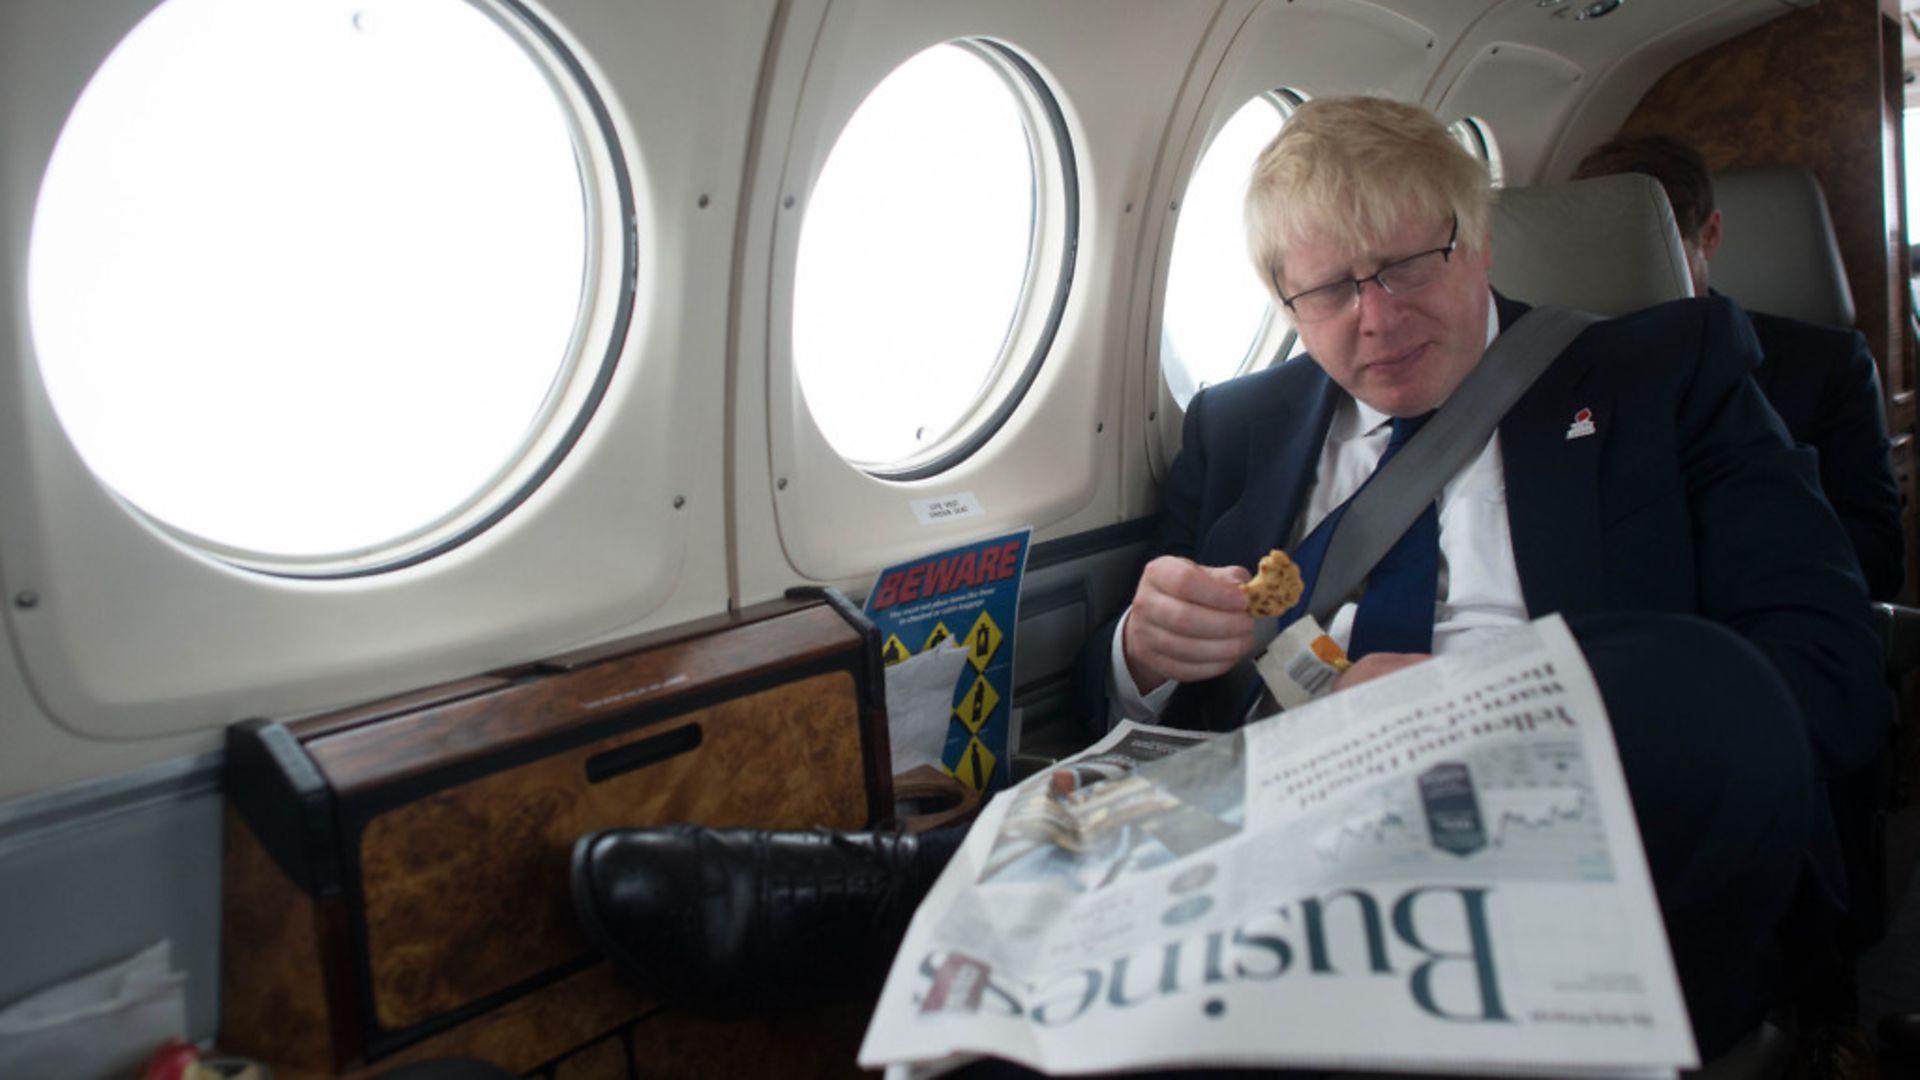 Boris Johnson reads a newspaper on a plane - Credit: Stefan Rousseau/PA